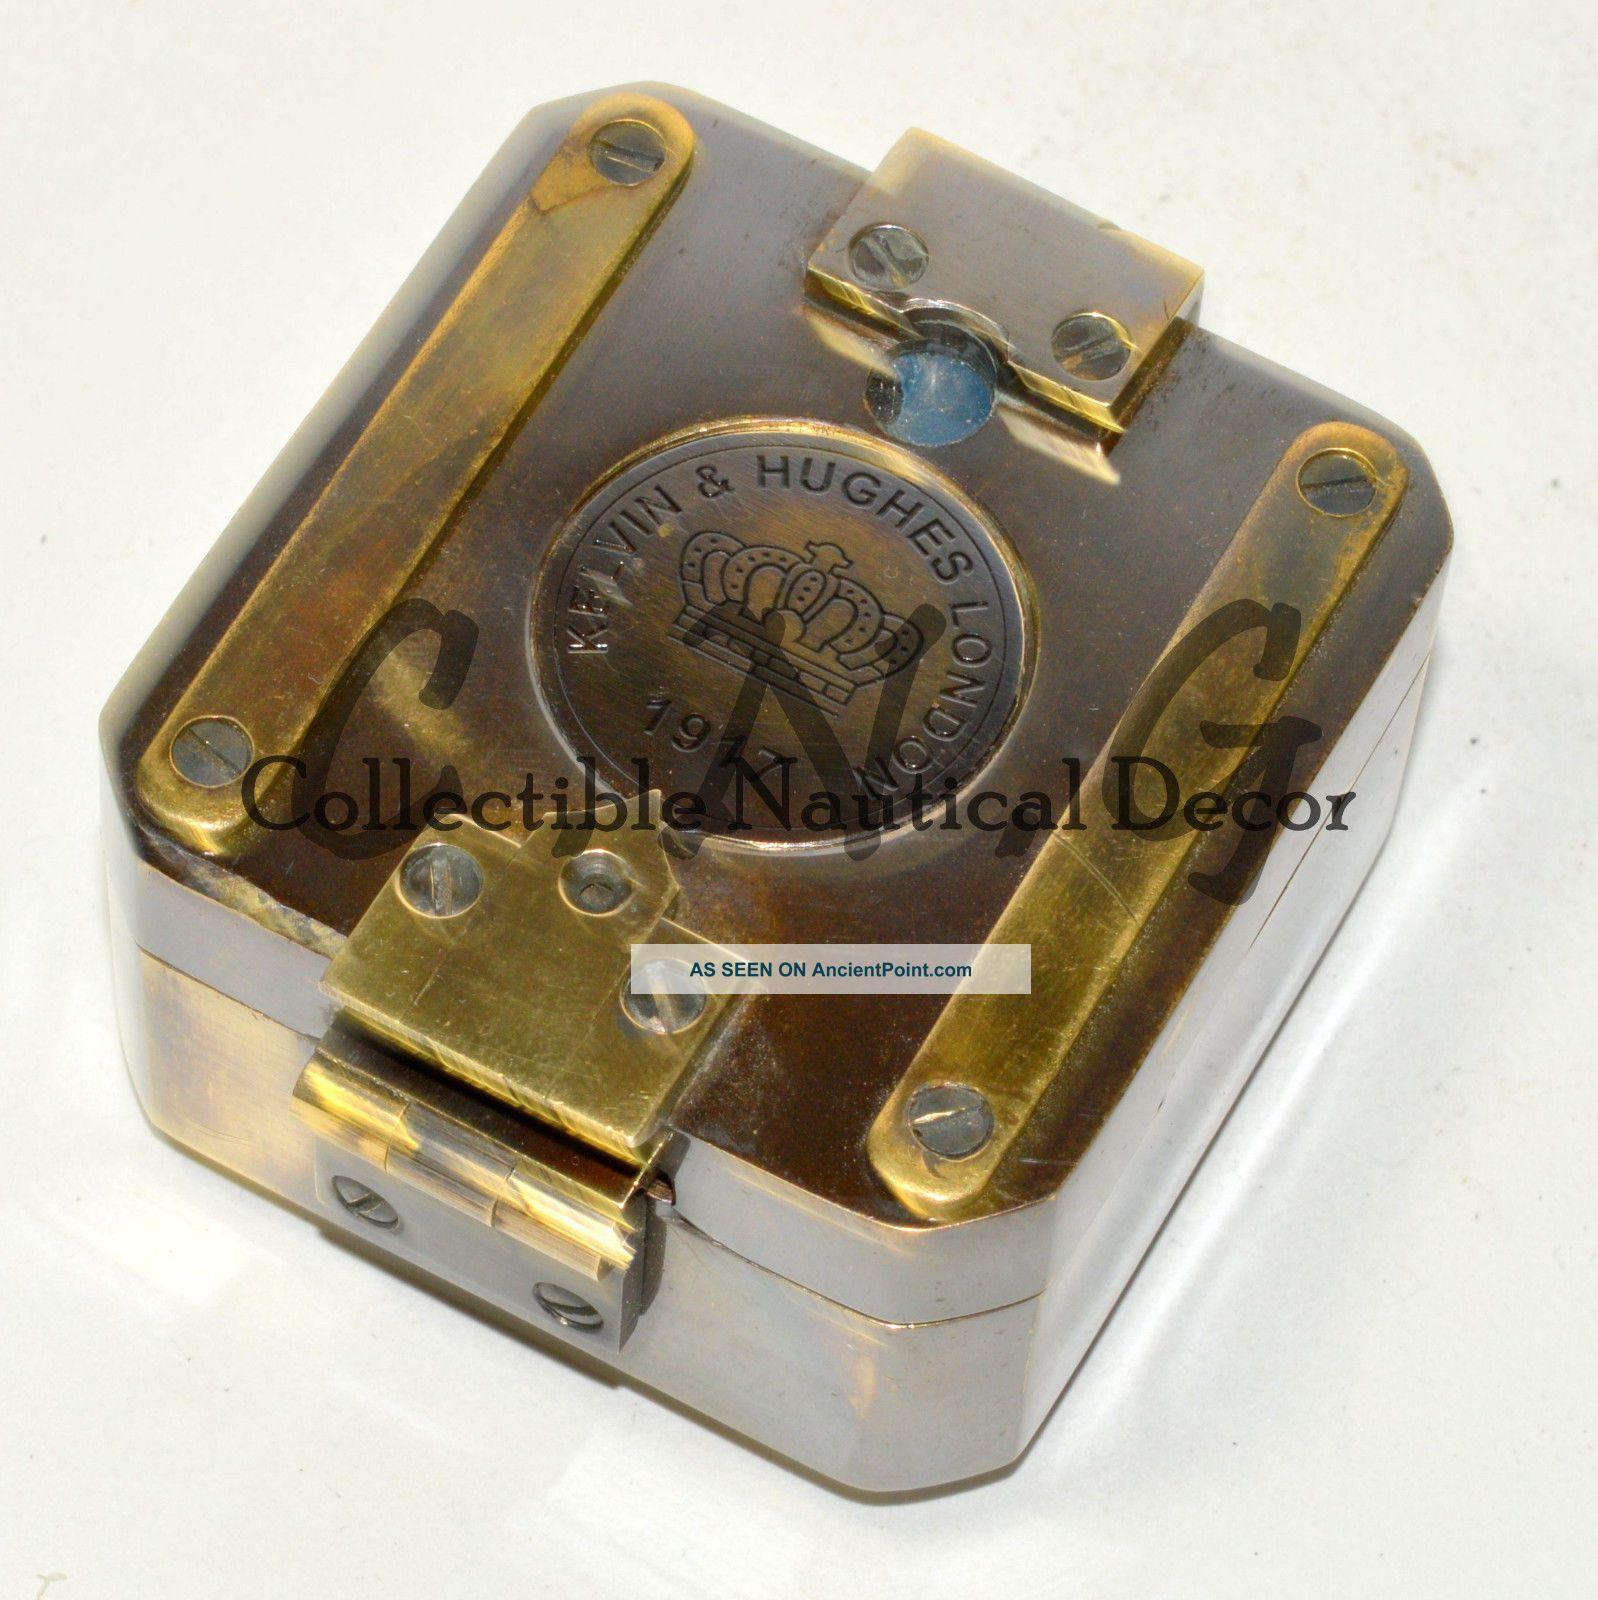 Kelvin & Hughs London 1917 Vintage Brass Brunton Compass 2.  5 Inch Compasses photo